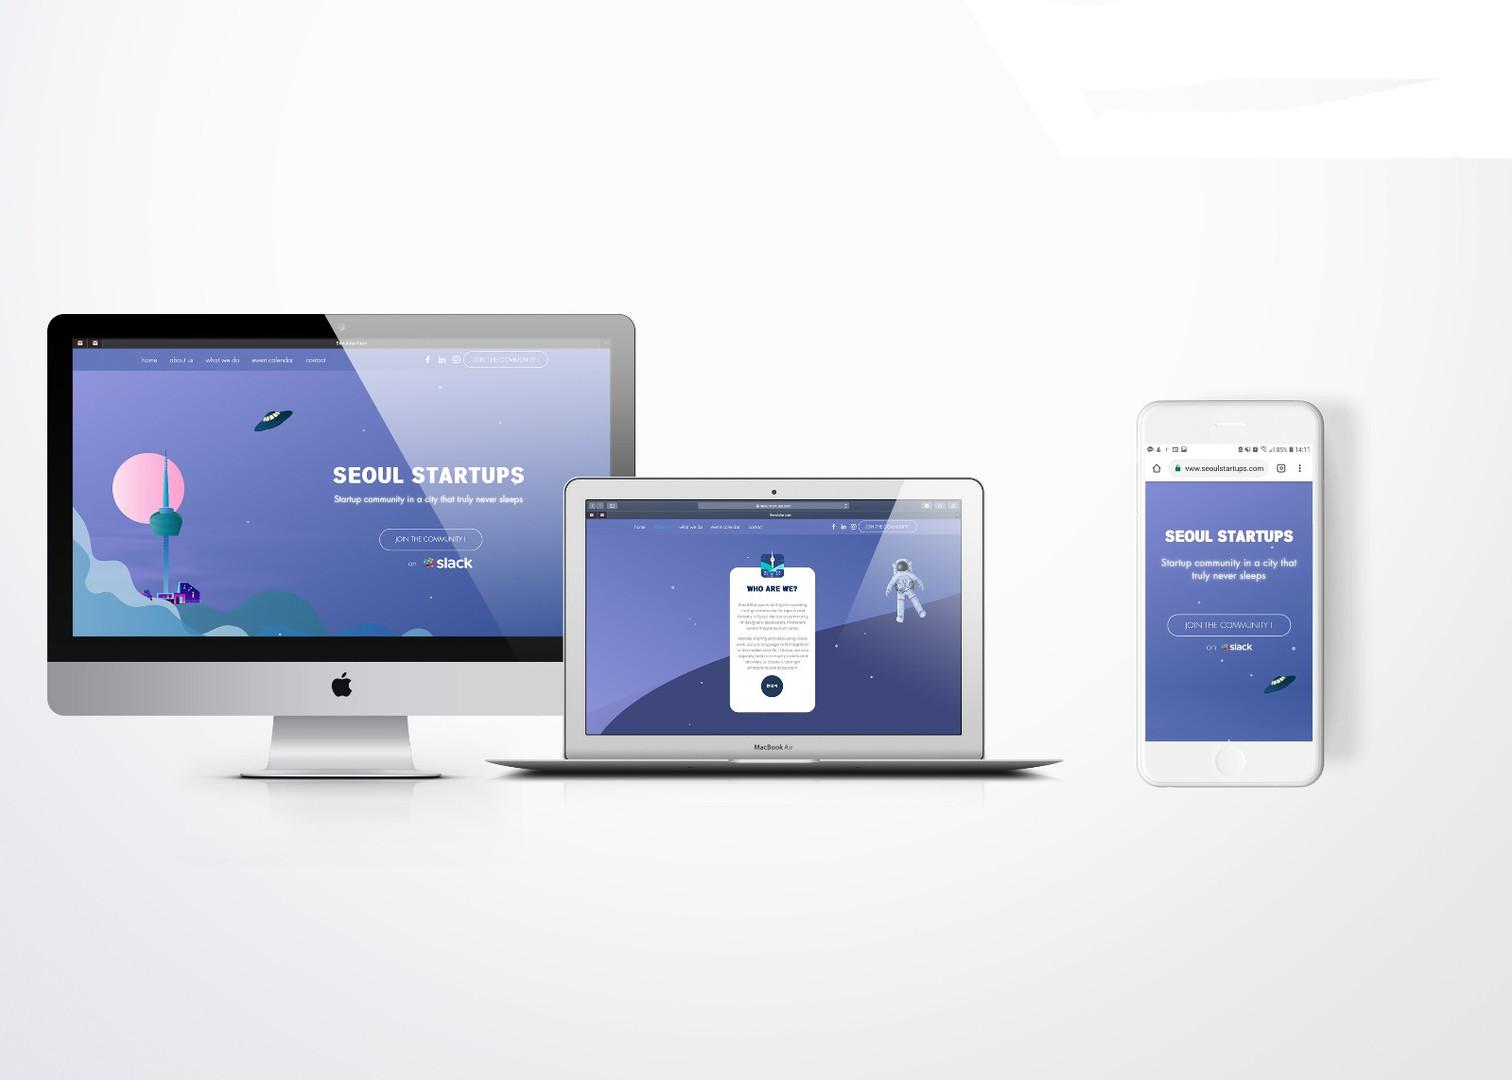 SEOUL STARTUPS - BRAND IMAGE & UX/UI